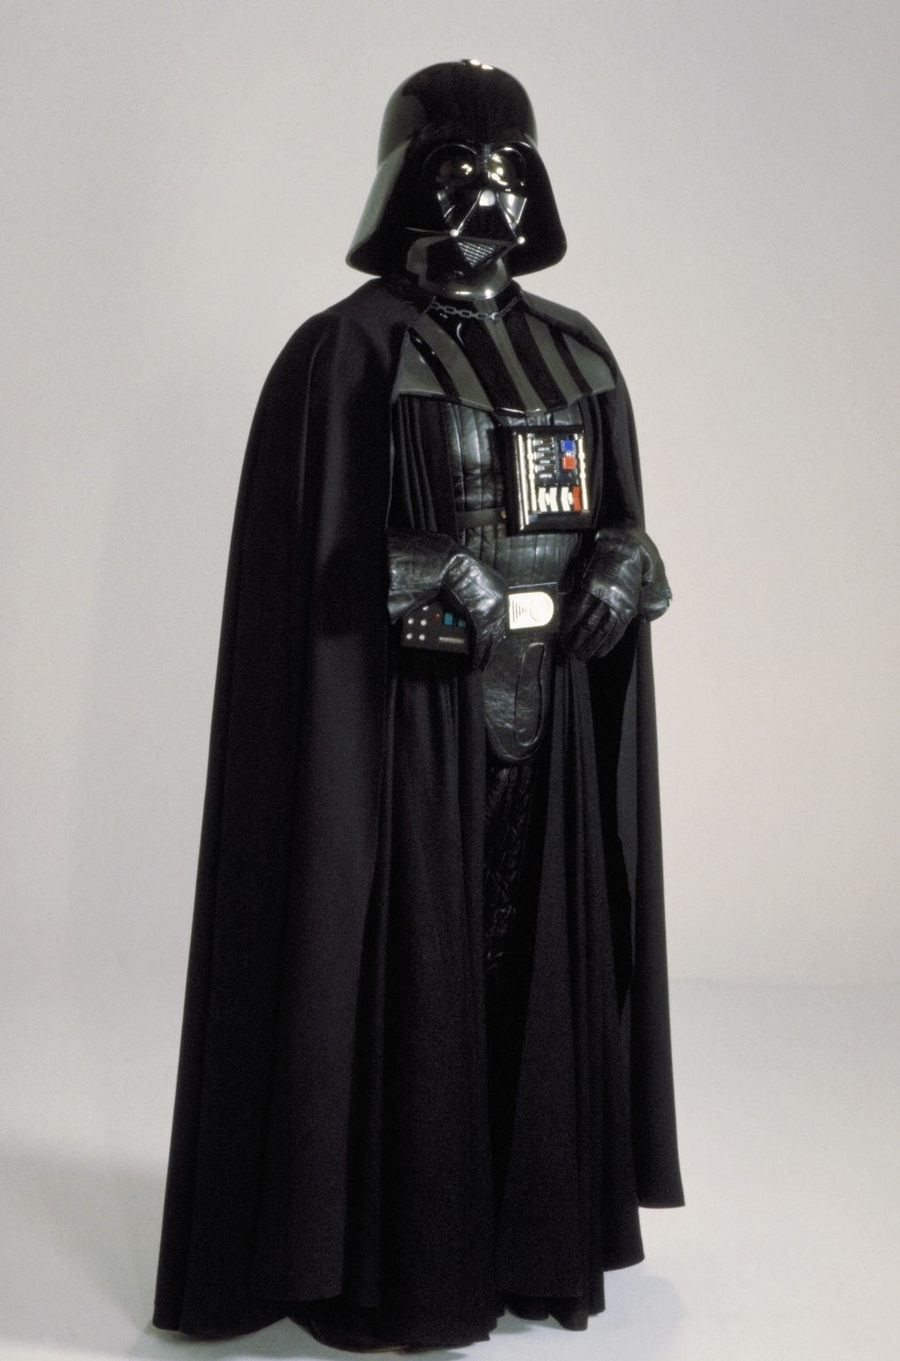 Darth Vader. Costume Design by John Mollo, Star Wars: A New Hope (1977)